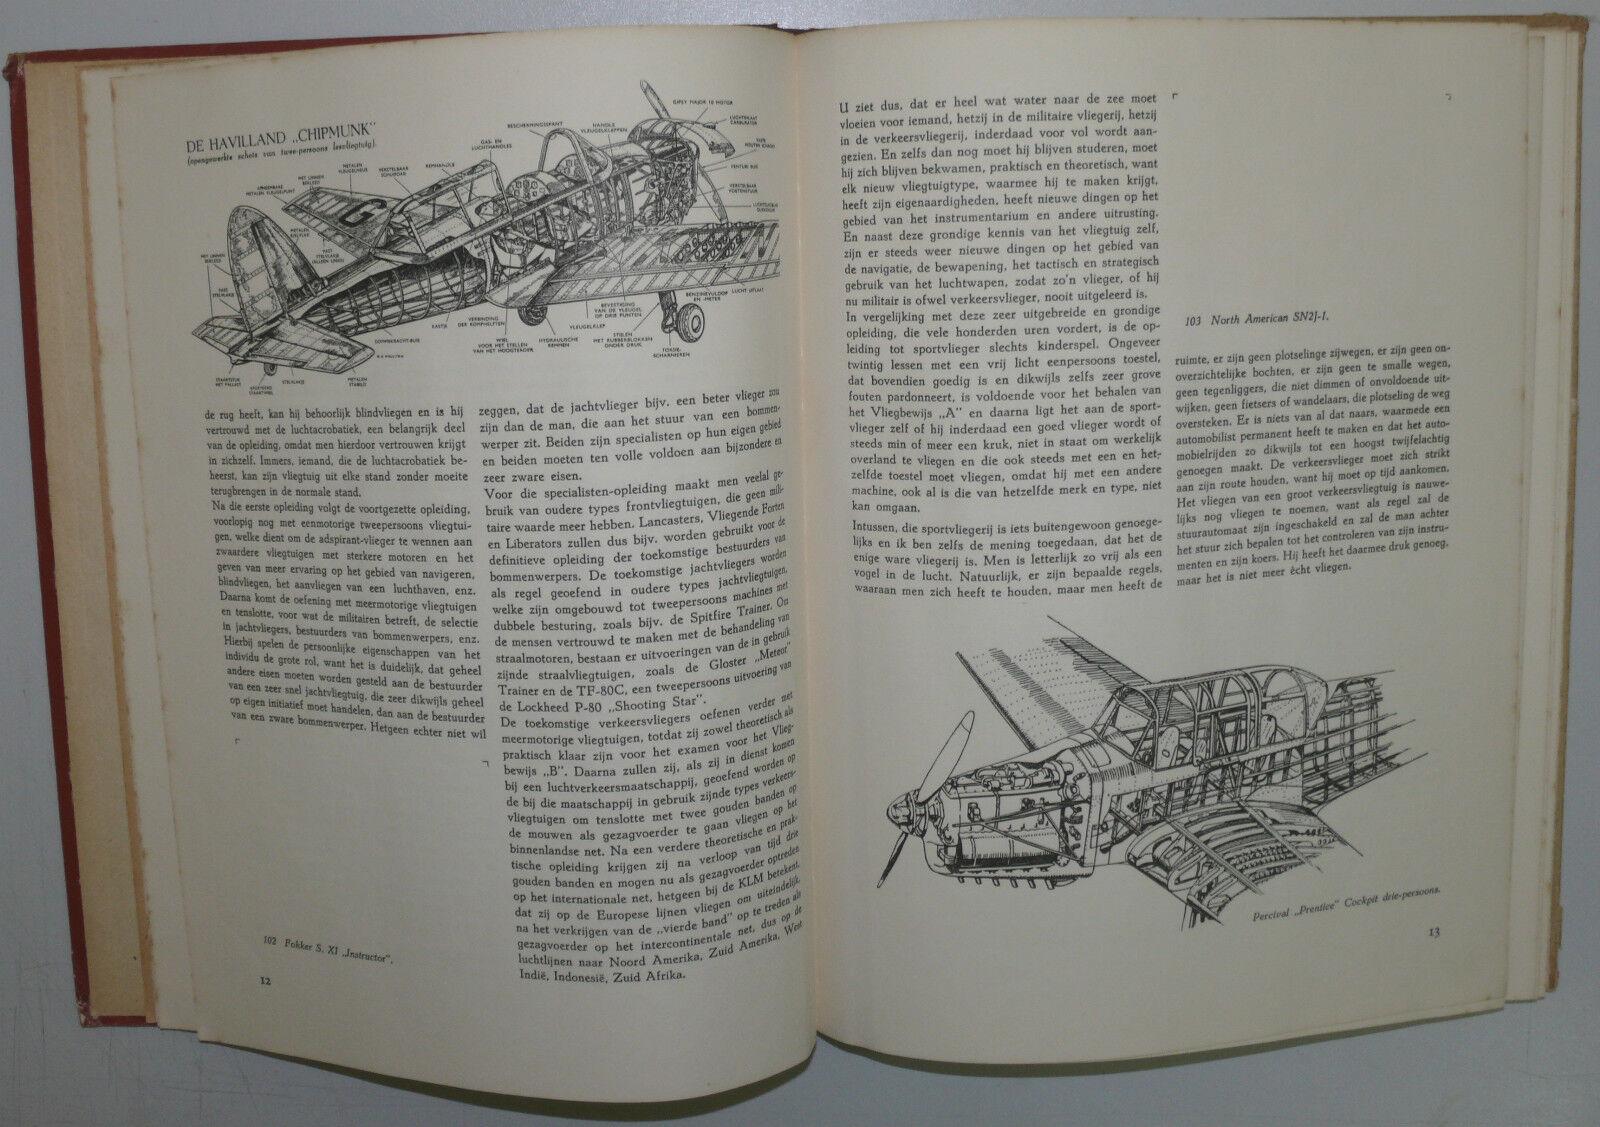 Vliegende Vleugels Luchtvaart van 1949 consejero niemeijer Groninga Groninga Groninga 920c48